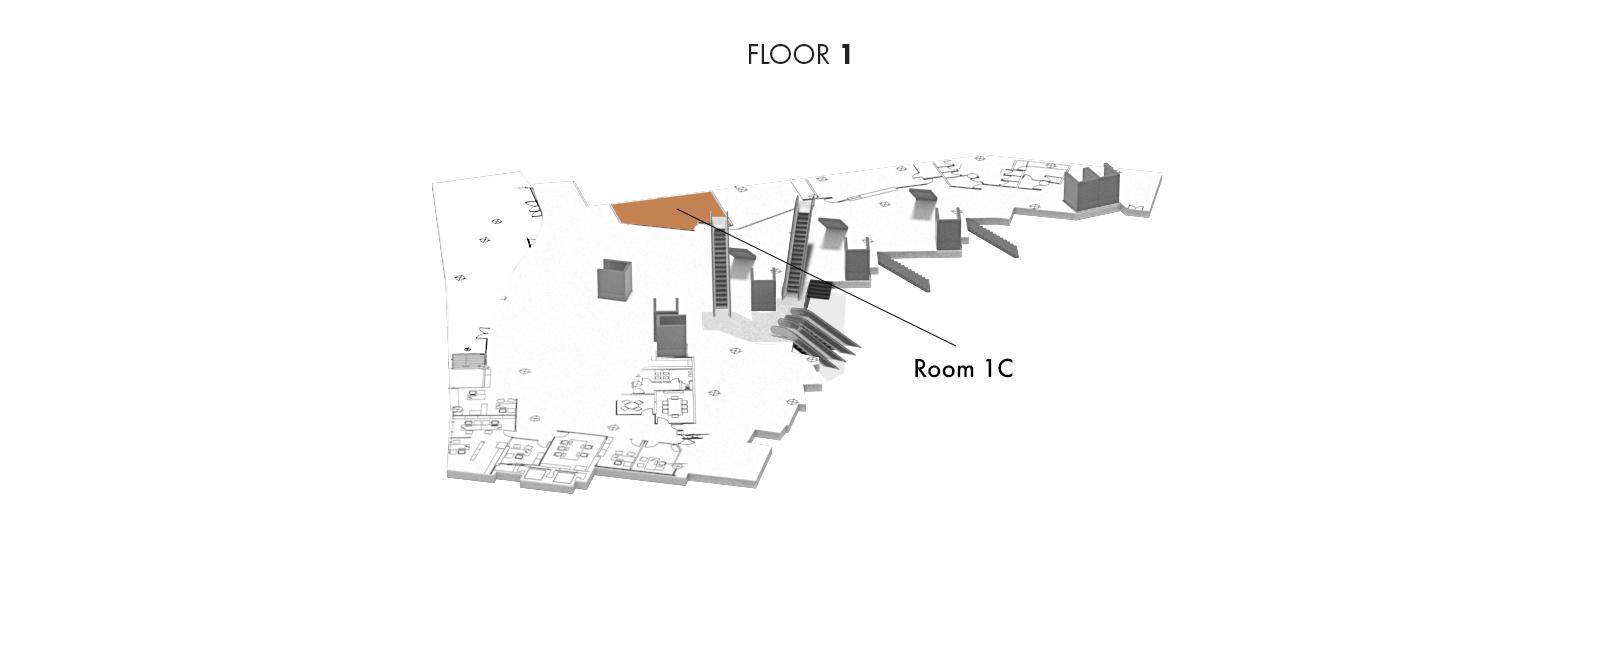 Room 1C, Floor 1 | Palacio Euskalduna Jauregia